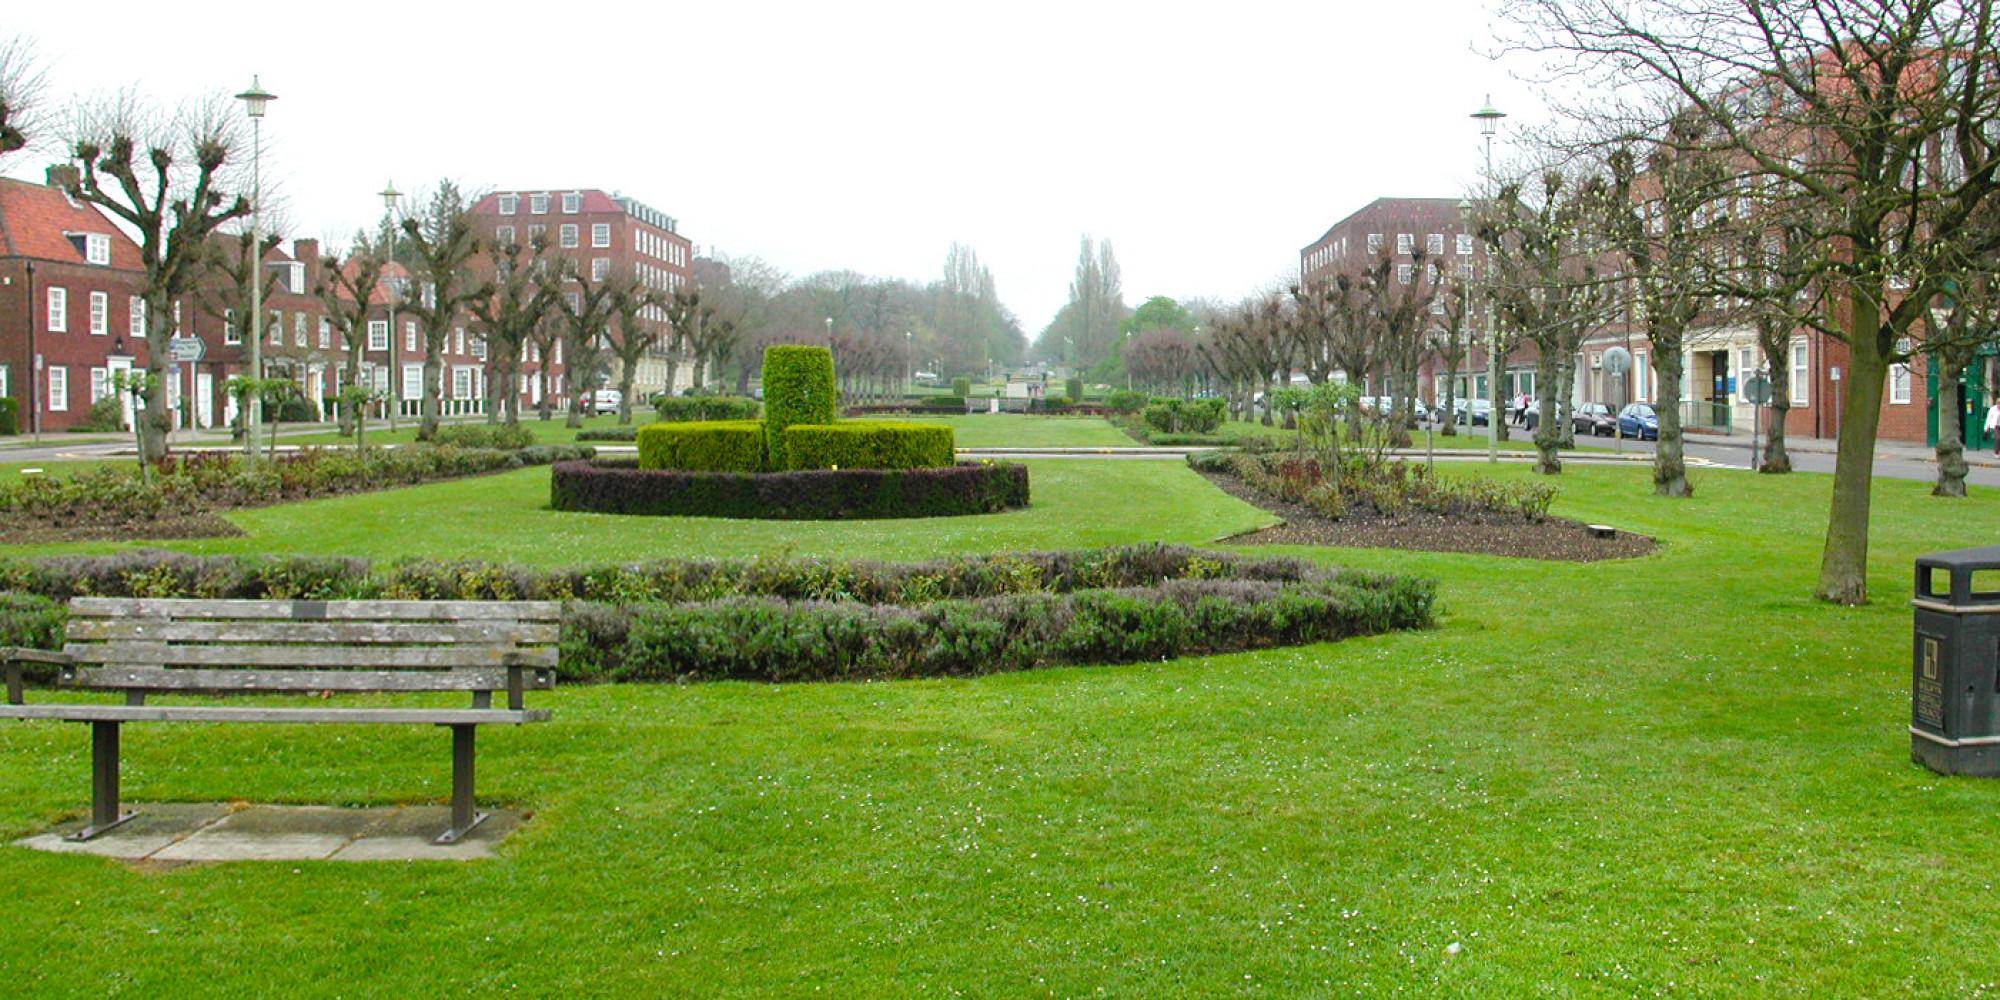 Garden Cities Plan 39 Kept Secret 39 By Tories Says Tim